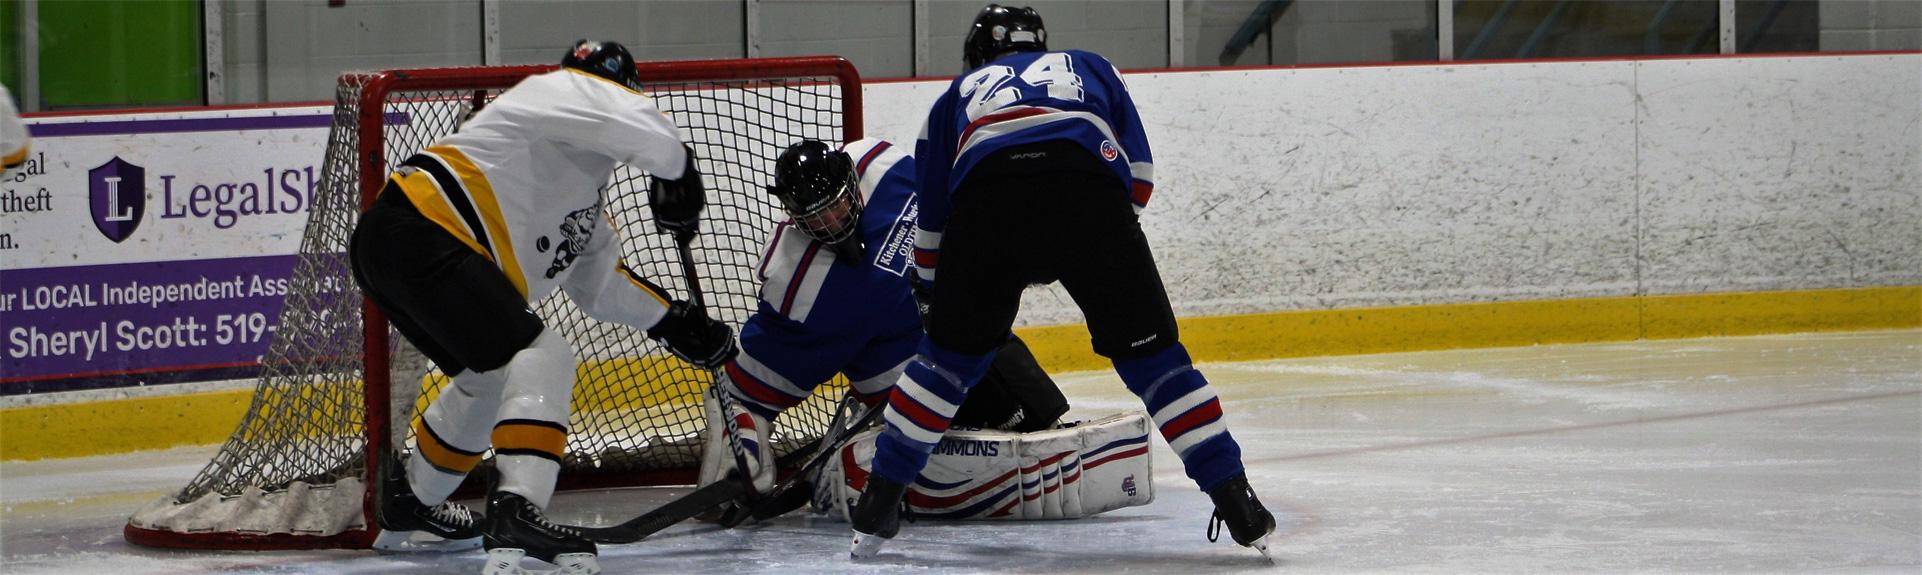 43rd Season of Hockey